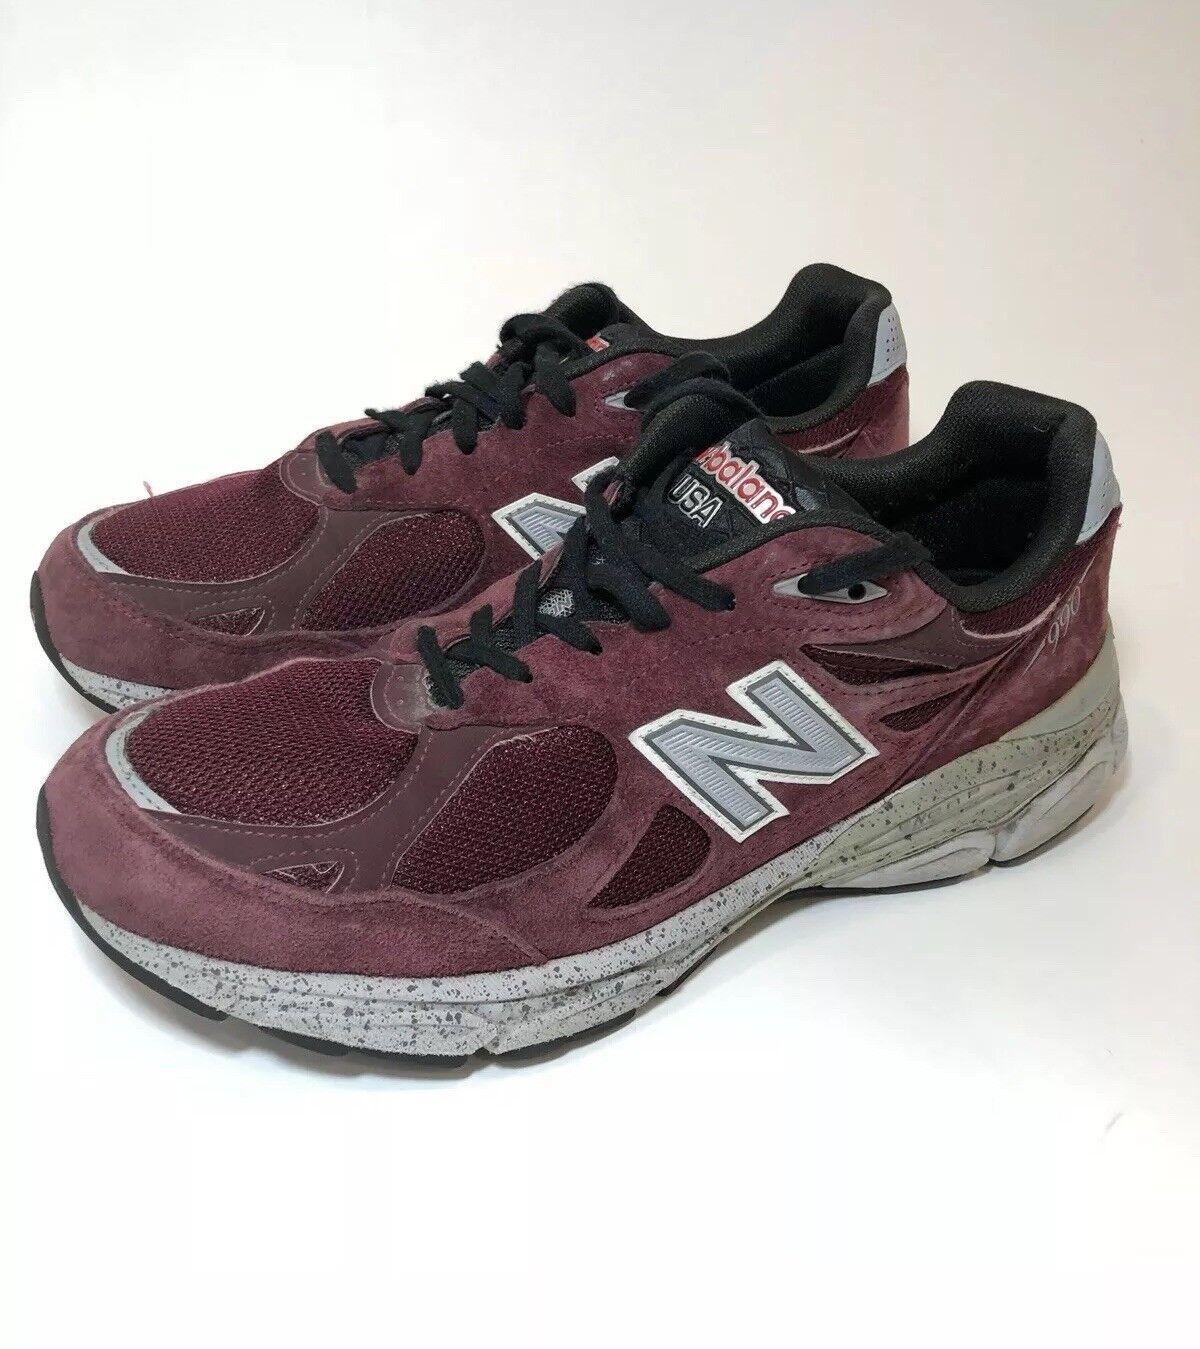 NEW BALANCE 990 Burgundy Running Sneakers Mens Size 10.5 M990BU3